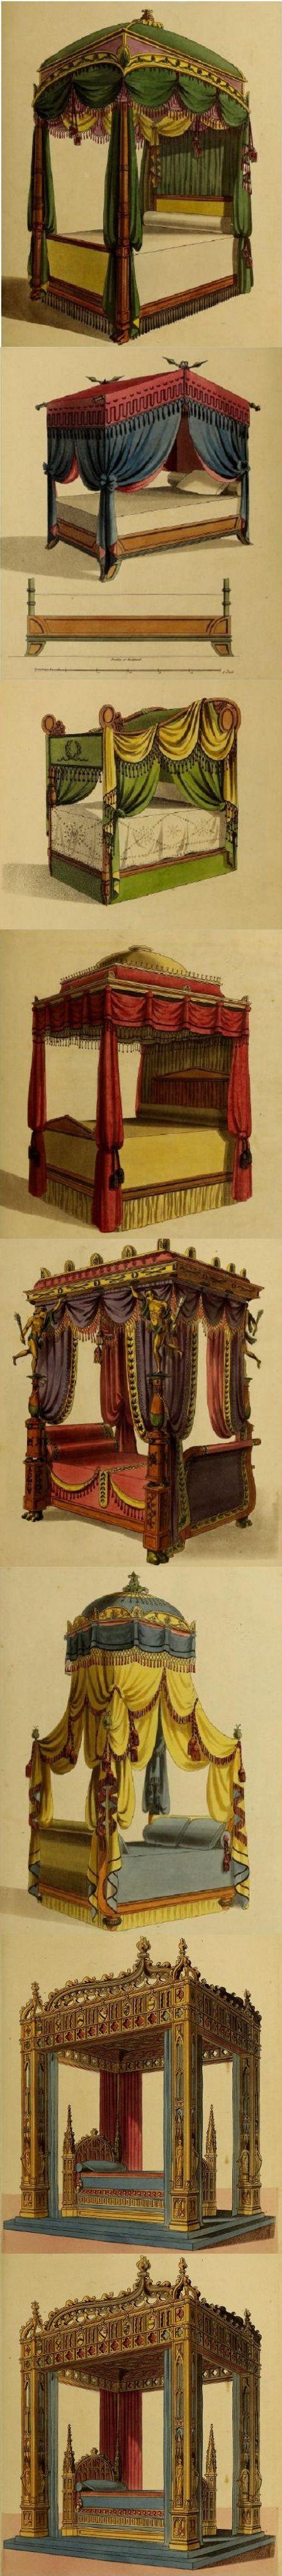 best 25+ victorian bed ideas on pinterest | victorian bed